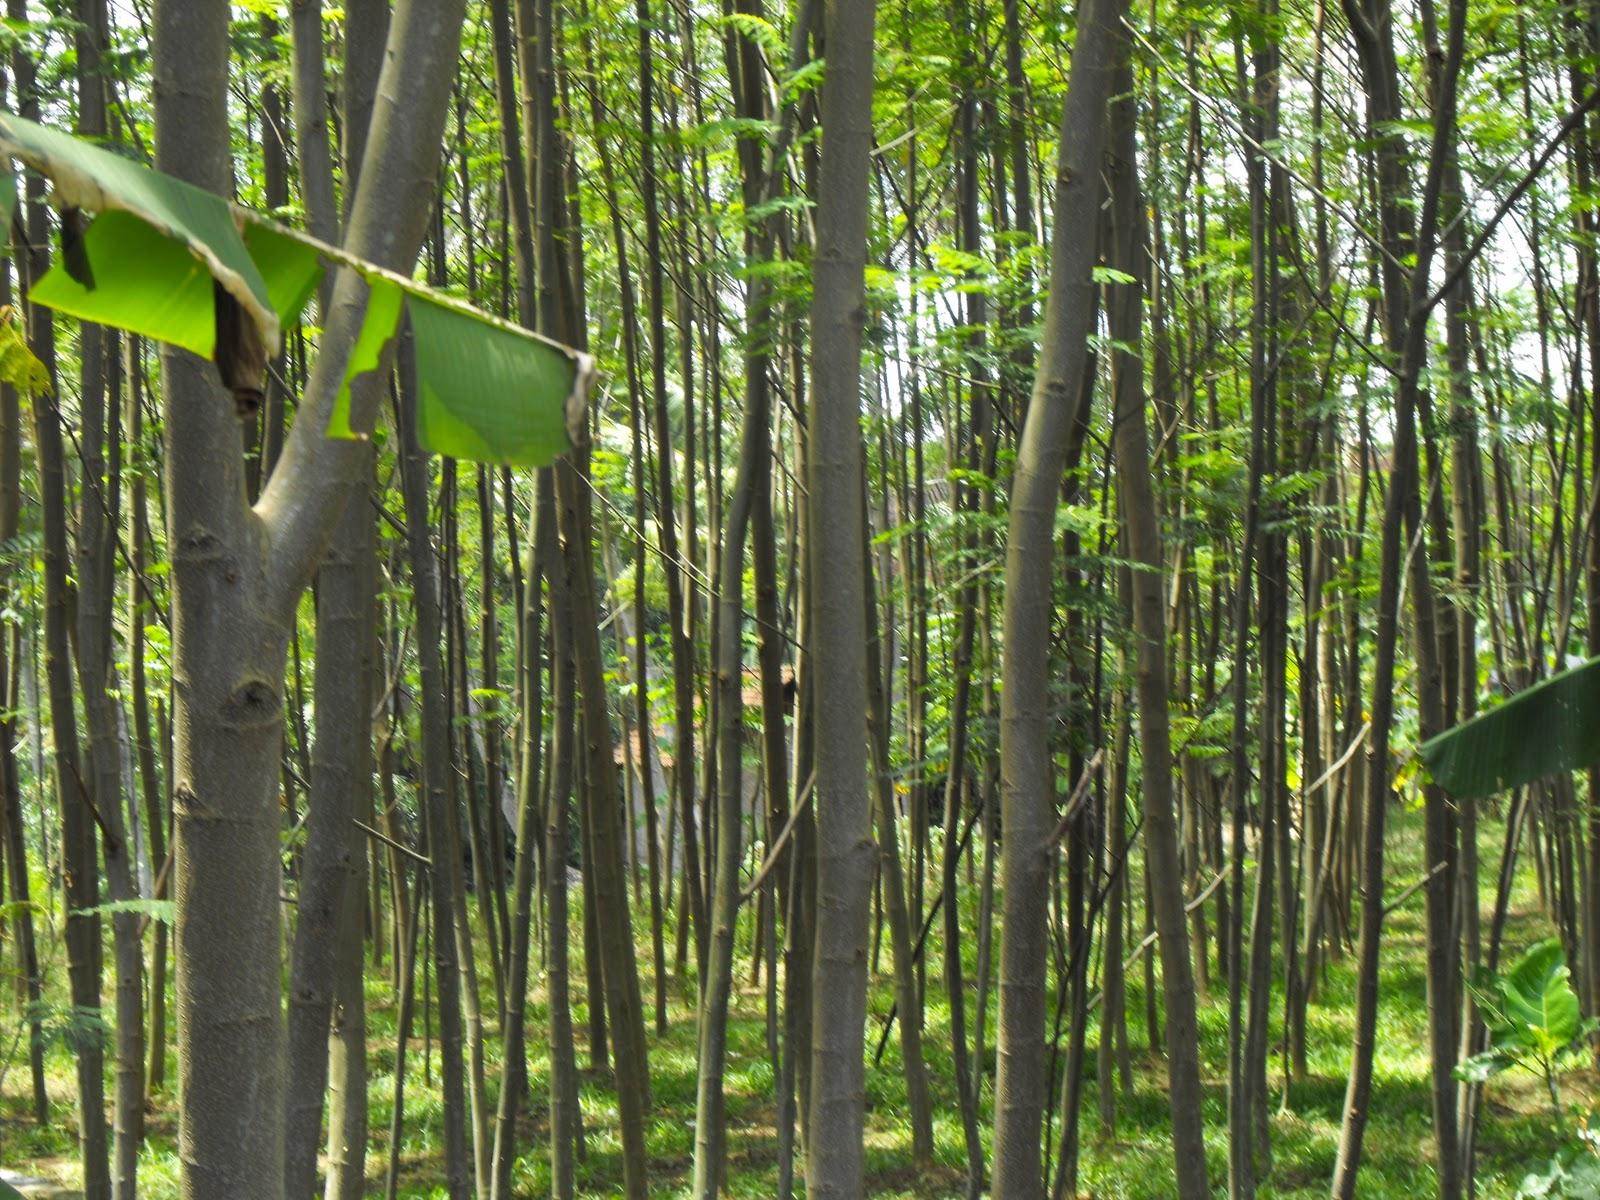 ANGKA BENTUK MAHONI (Swietenia macrophylla) DI HUTAN RAKYAT DI KABUPATEN CIAMIS